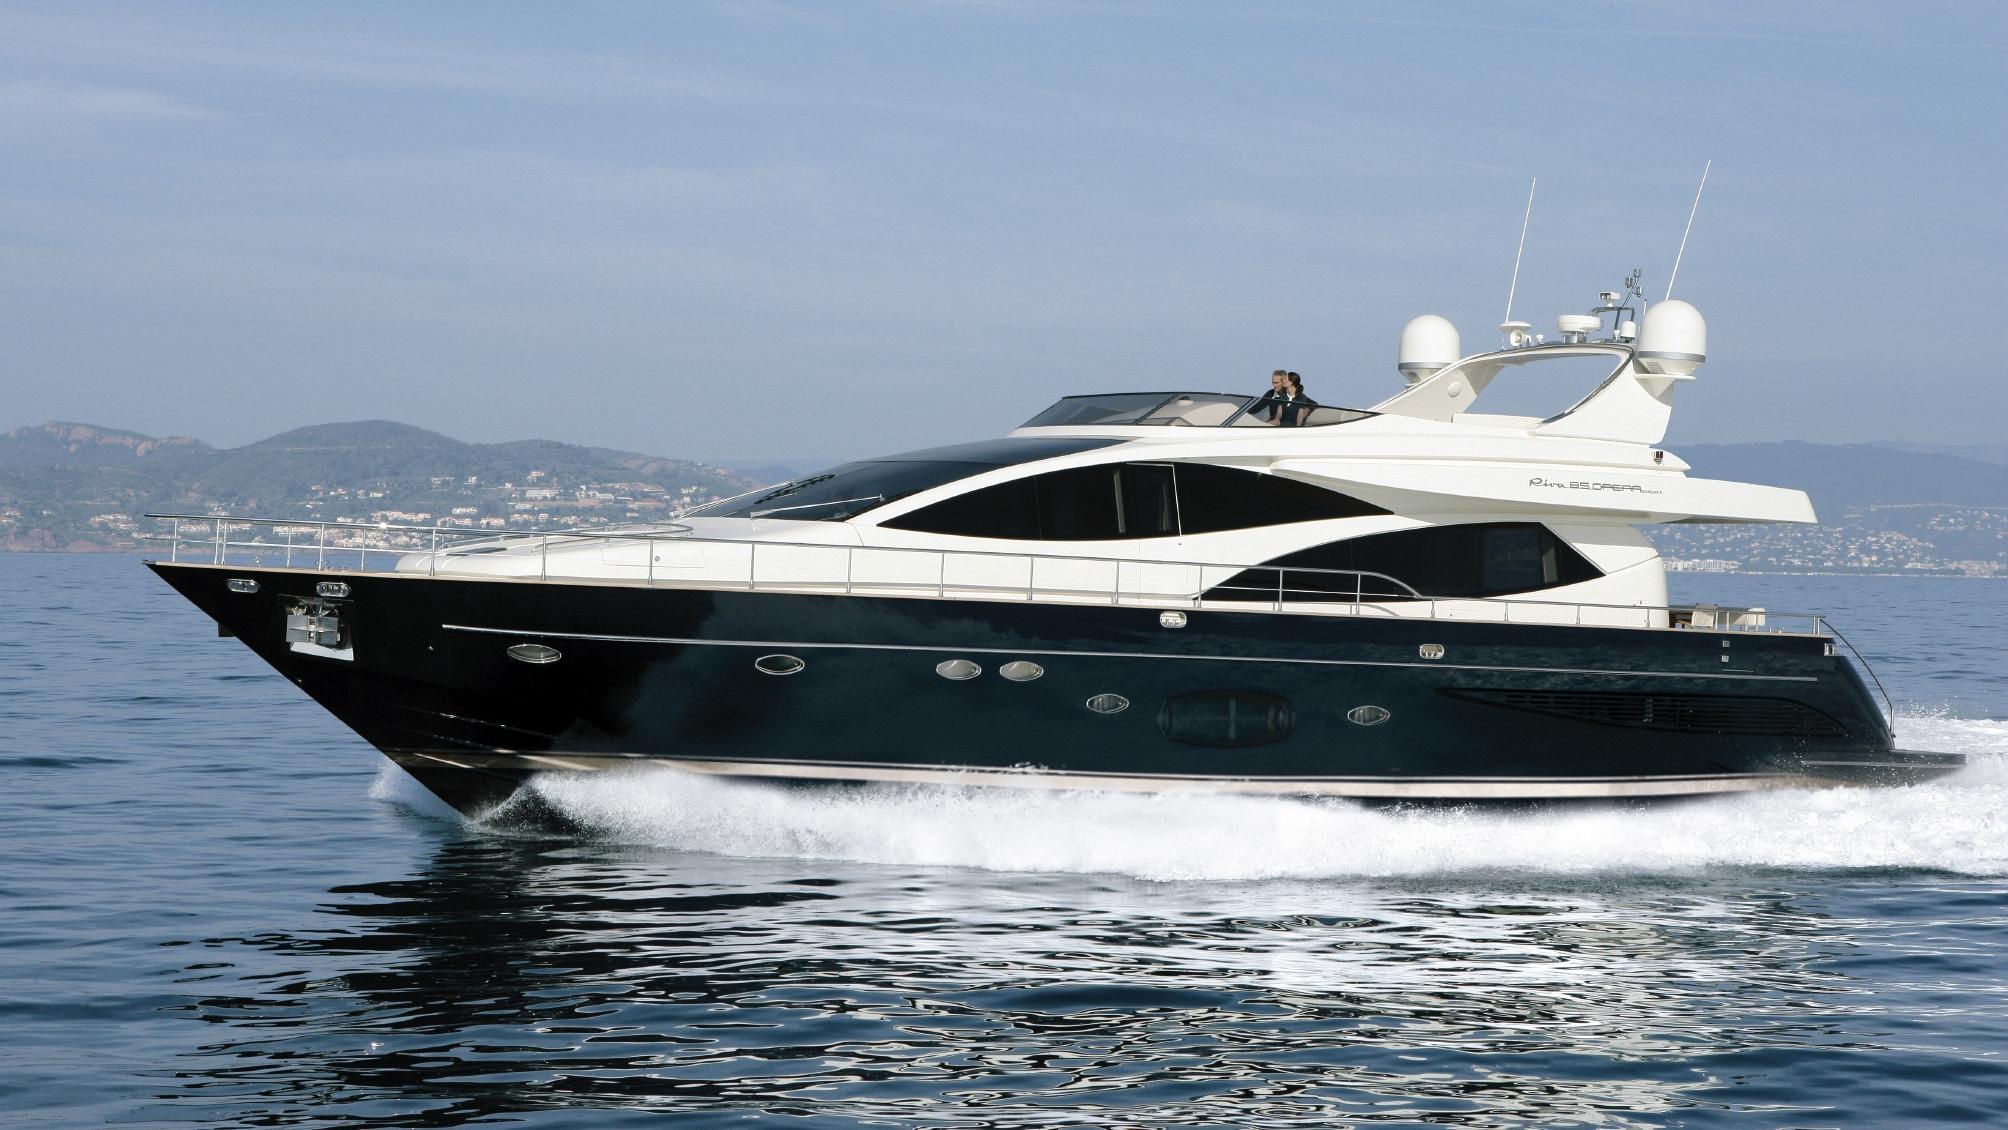 riva-opera-85-9-motor-yacht-2006-26m-cruising